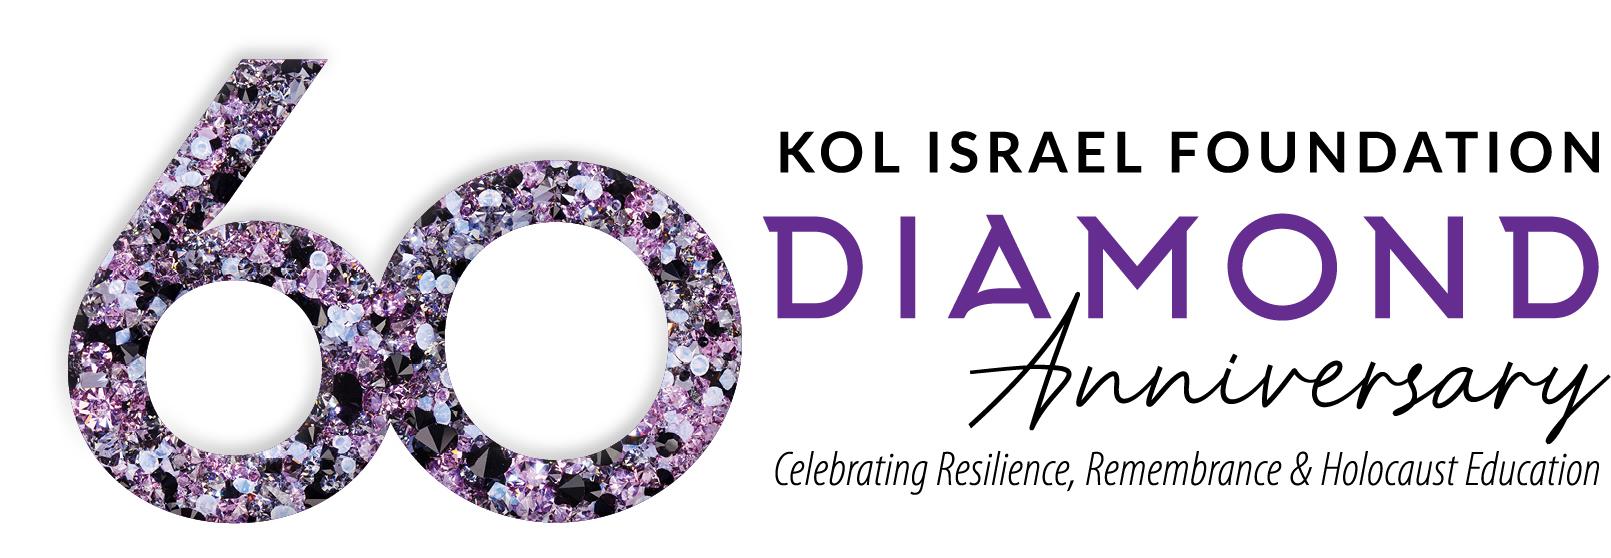 Kol Israel - 60 Diamond Anniversary Gala LogosFinalWhite.jpg